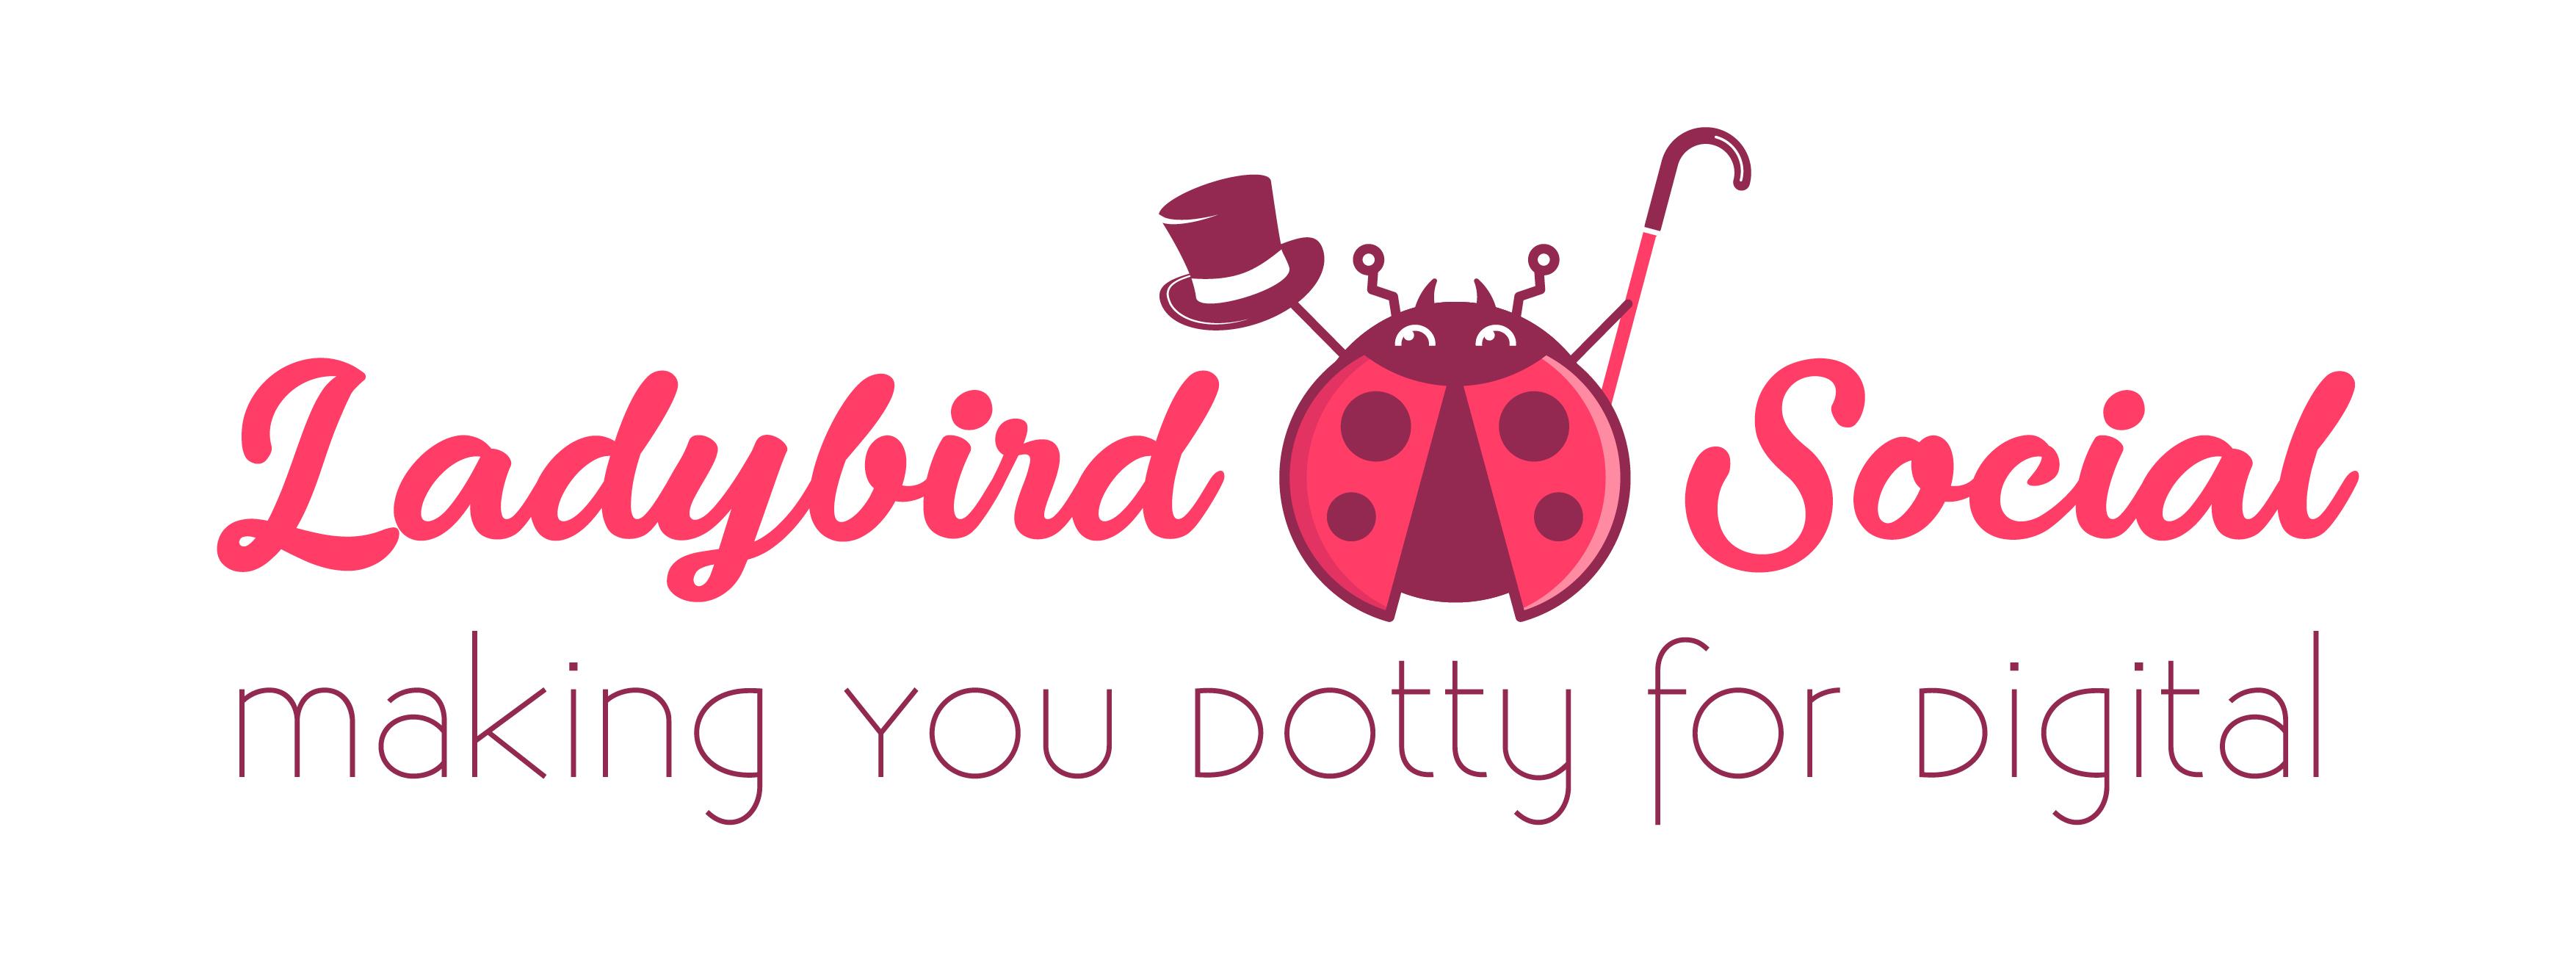 LB563 Ladybird social logo final